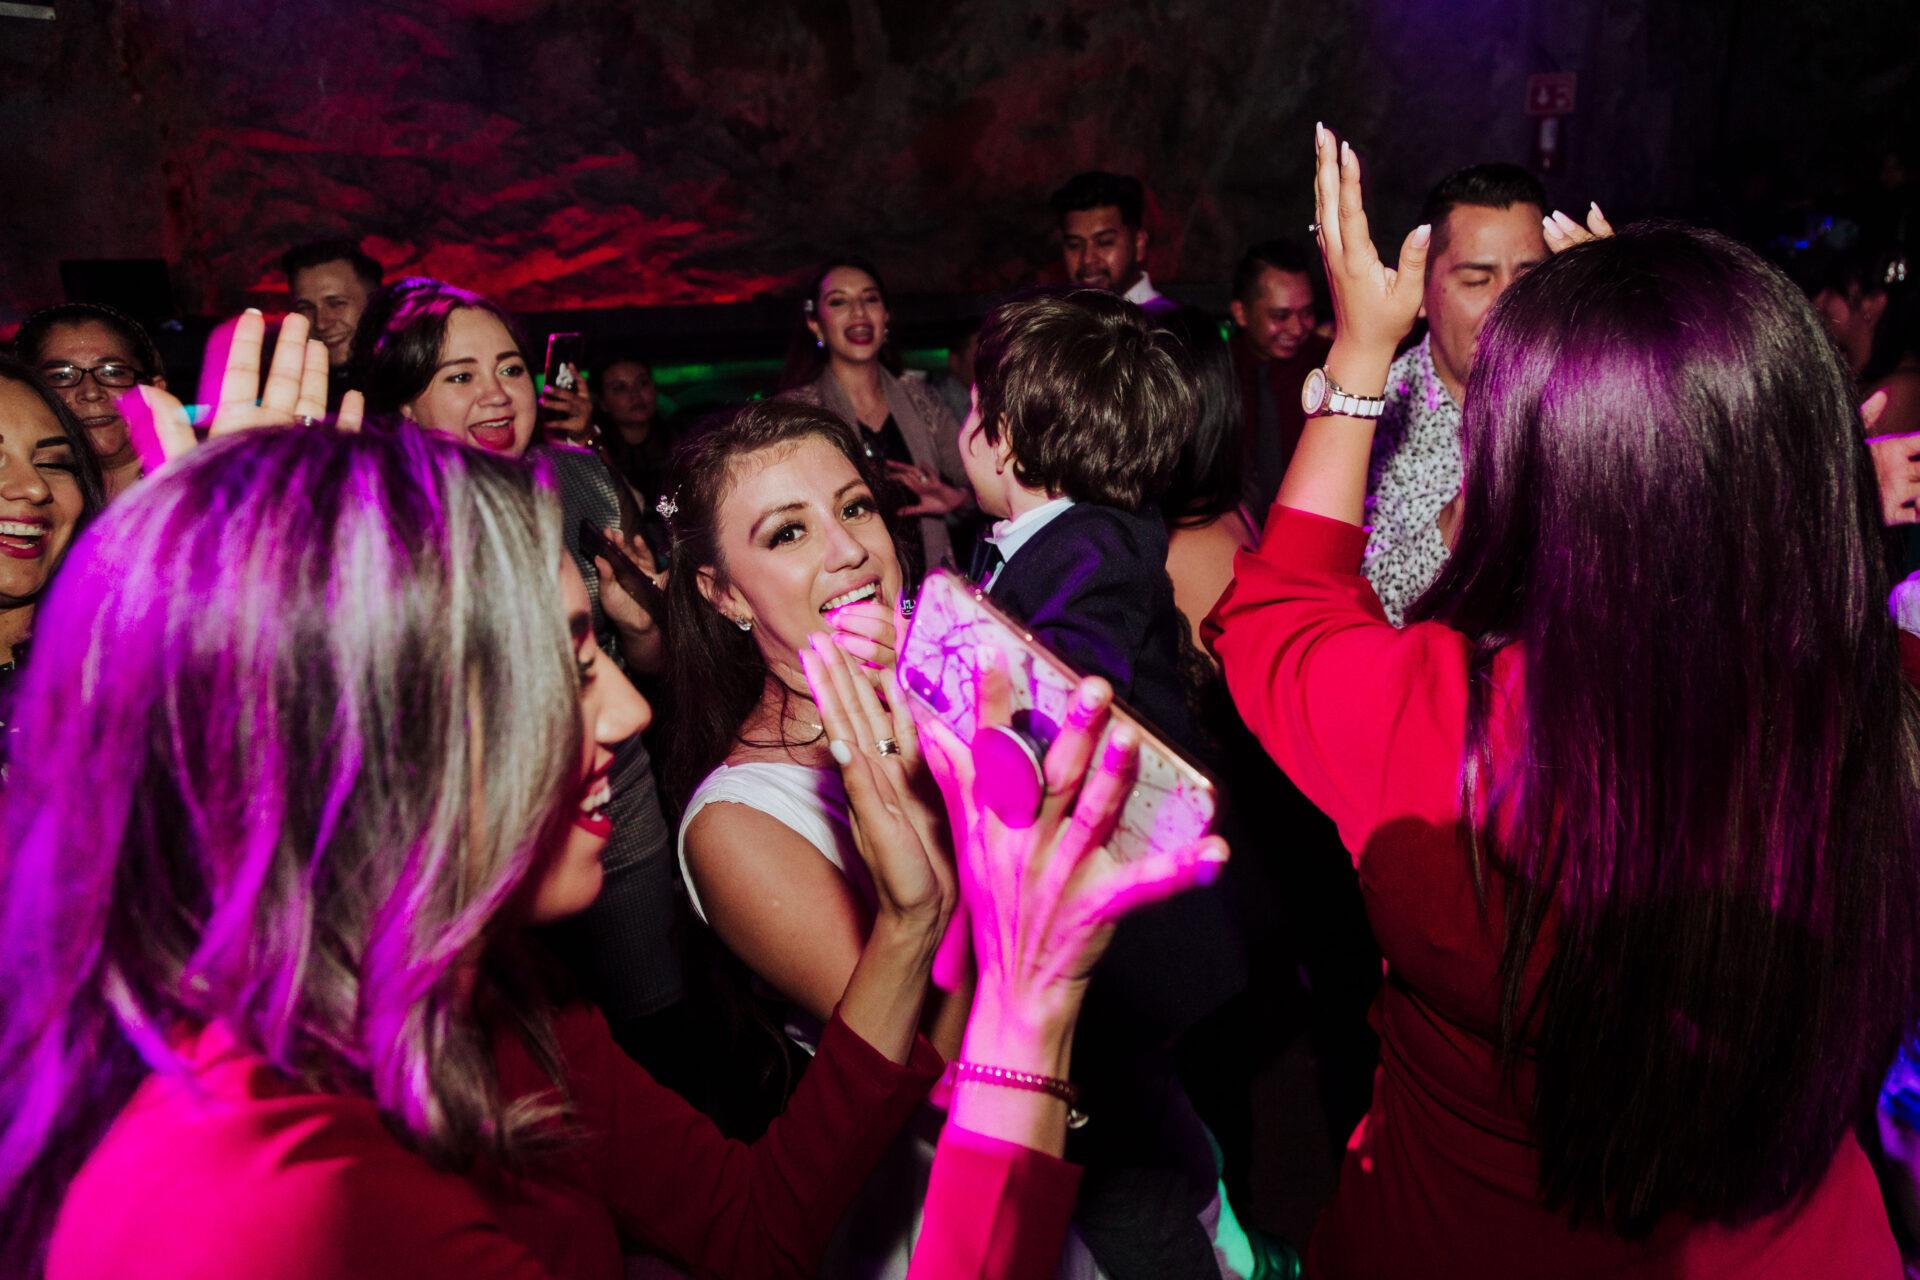 javier_noriega_fotografo_bodas_la_mina_club_zacatecas_wedding_photographer29